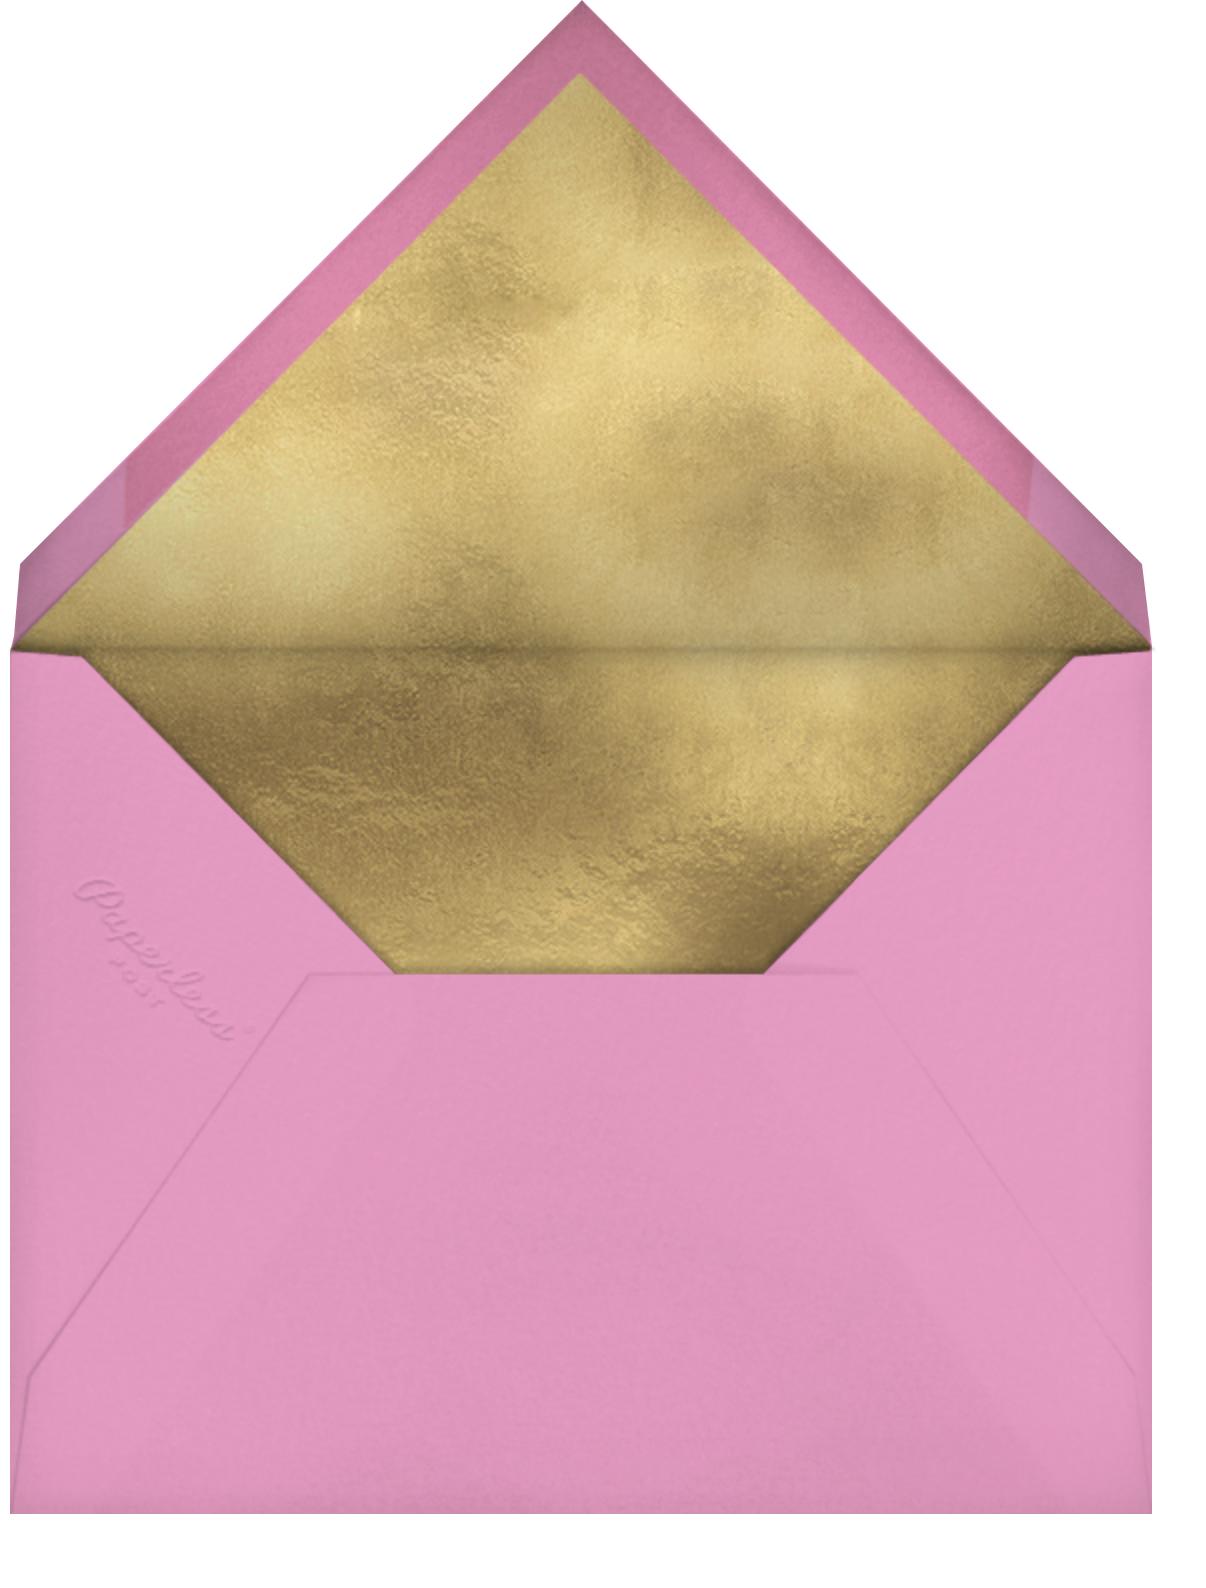 Baby Bunting - Pinks - Meri Meri - Envelope